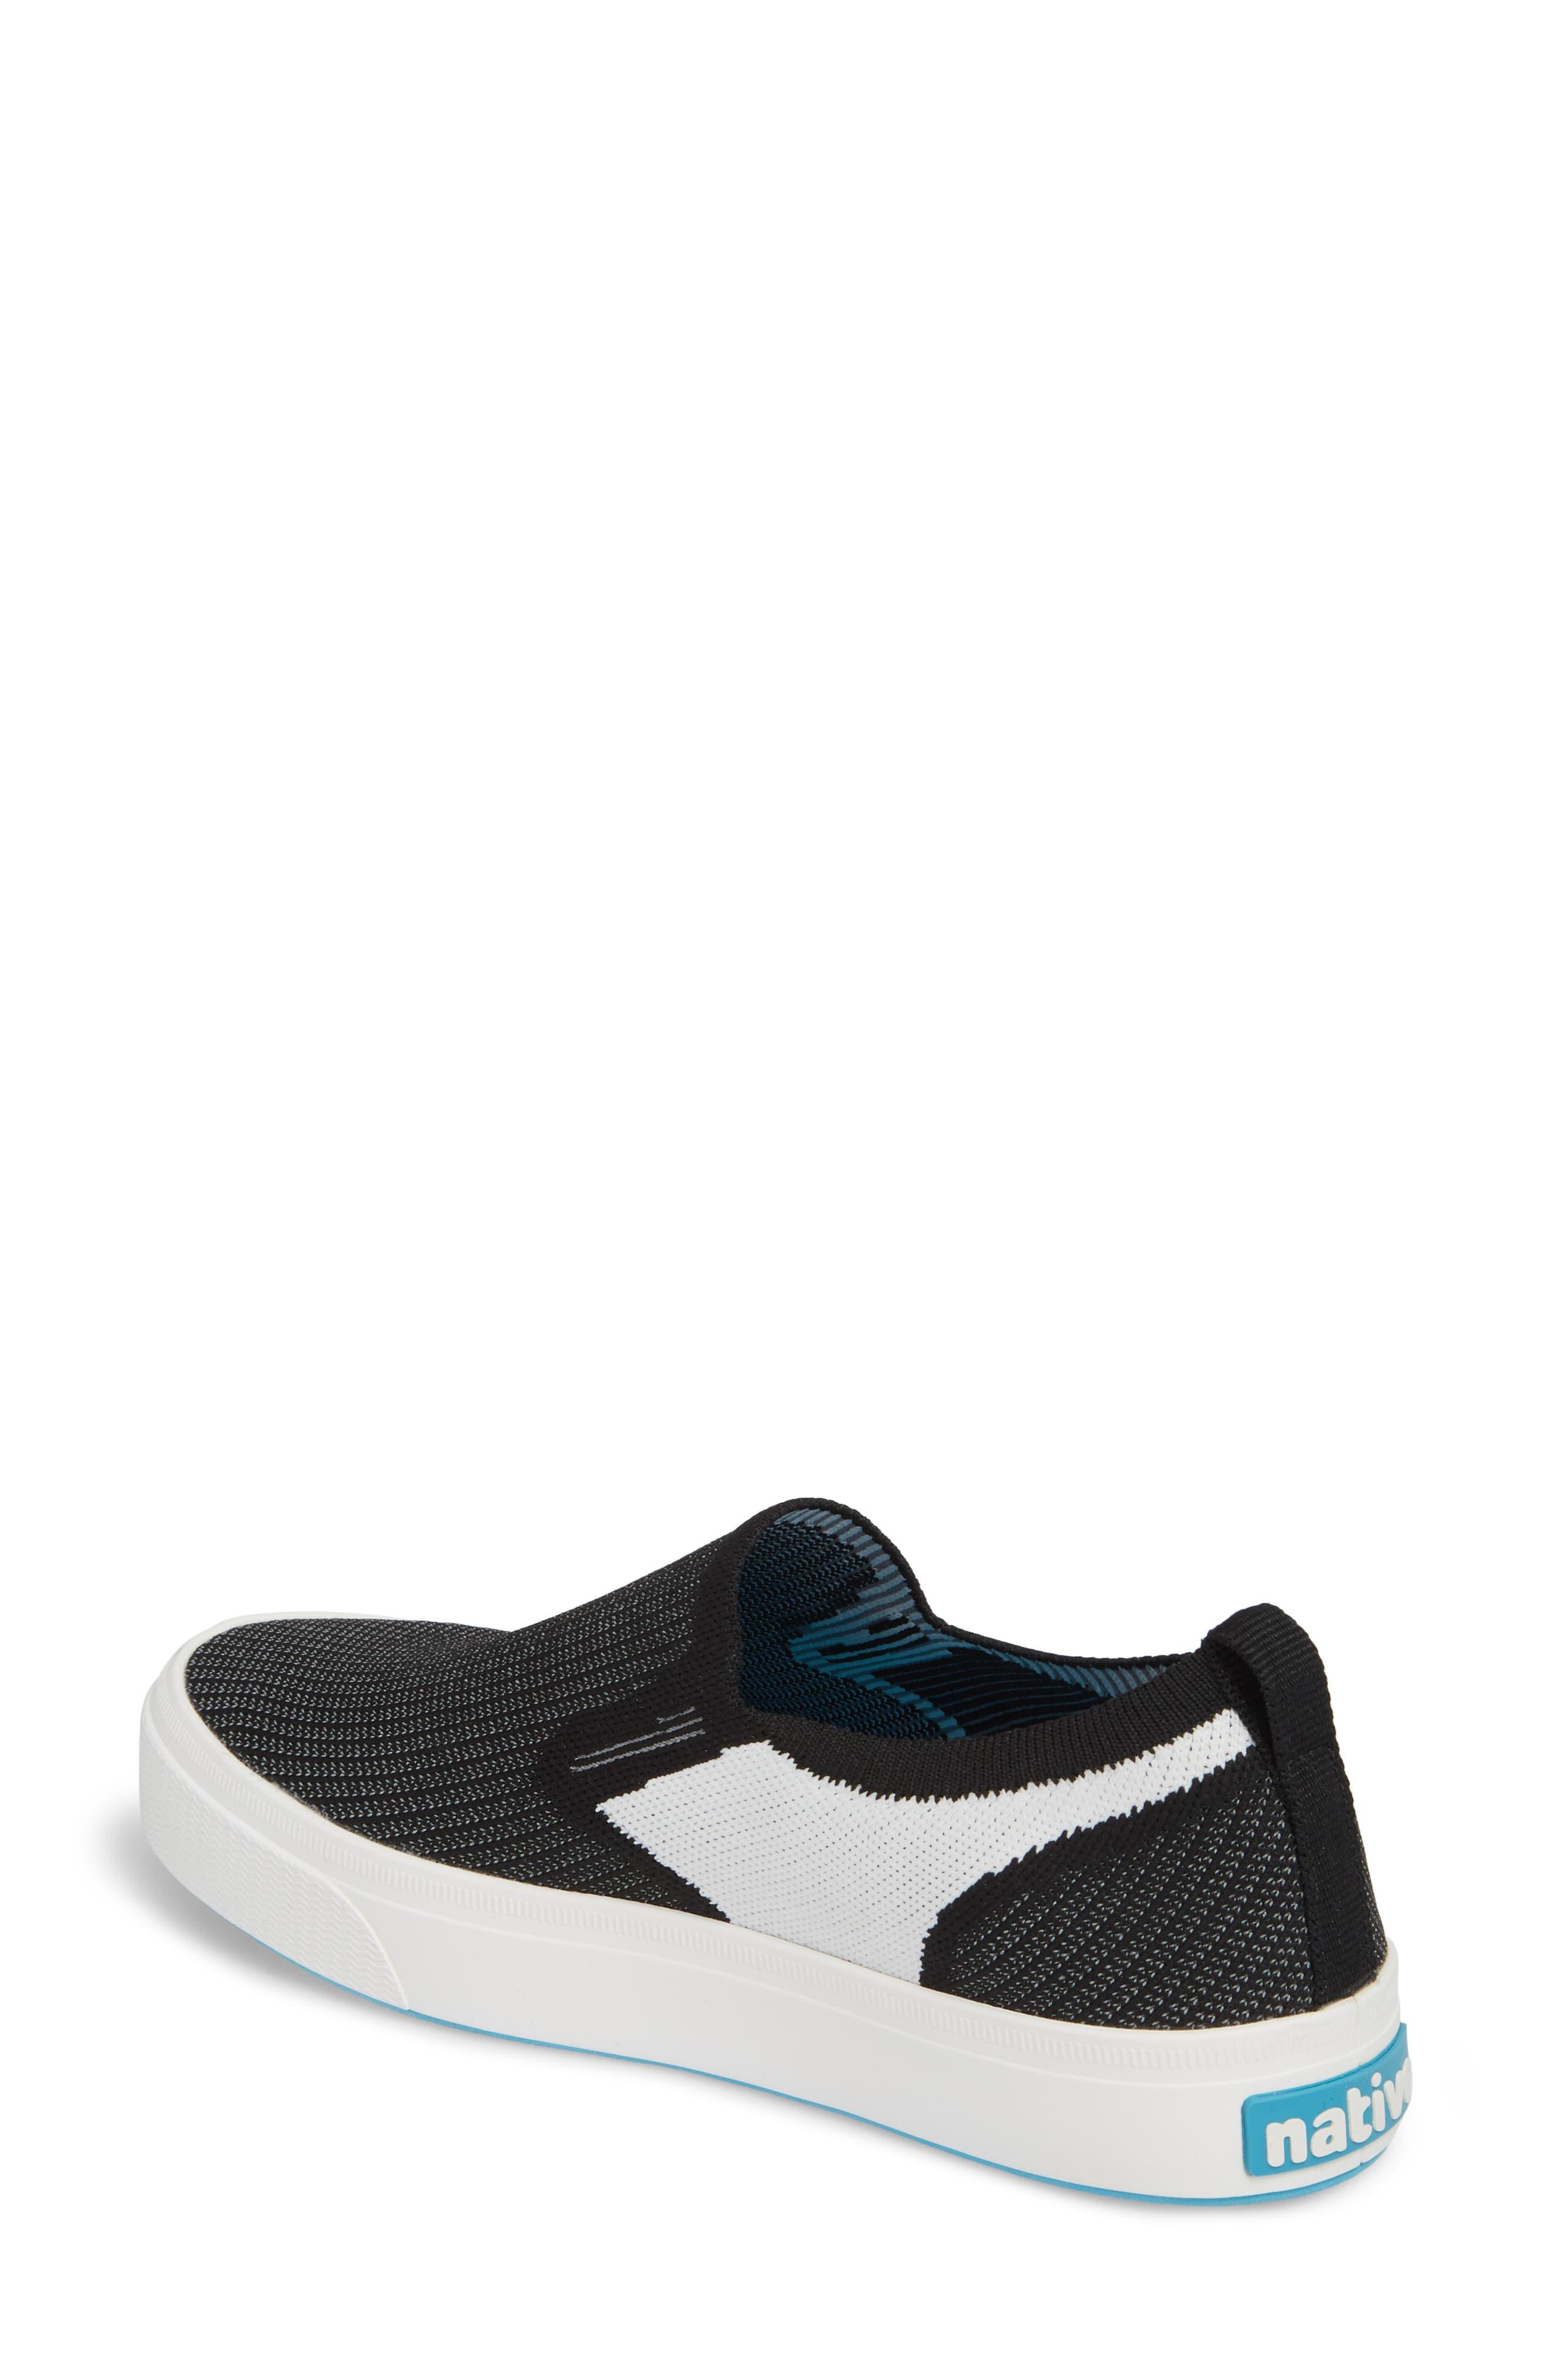 Miles Liteknit Slip-On Sneaker,                             Alternate thumbnail 2, color,                             JIFFY BLACK/ SHELL WHITE